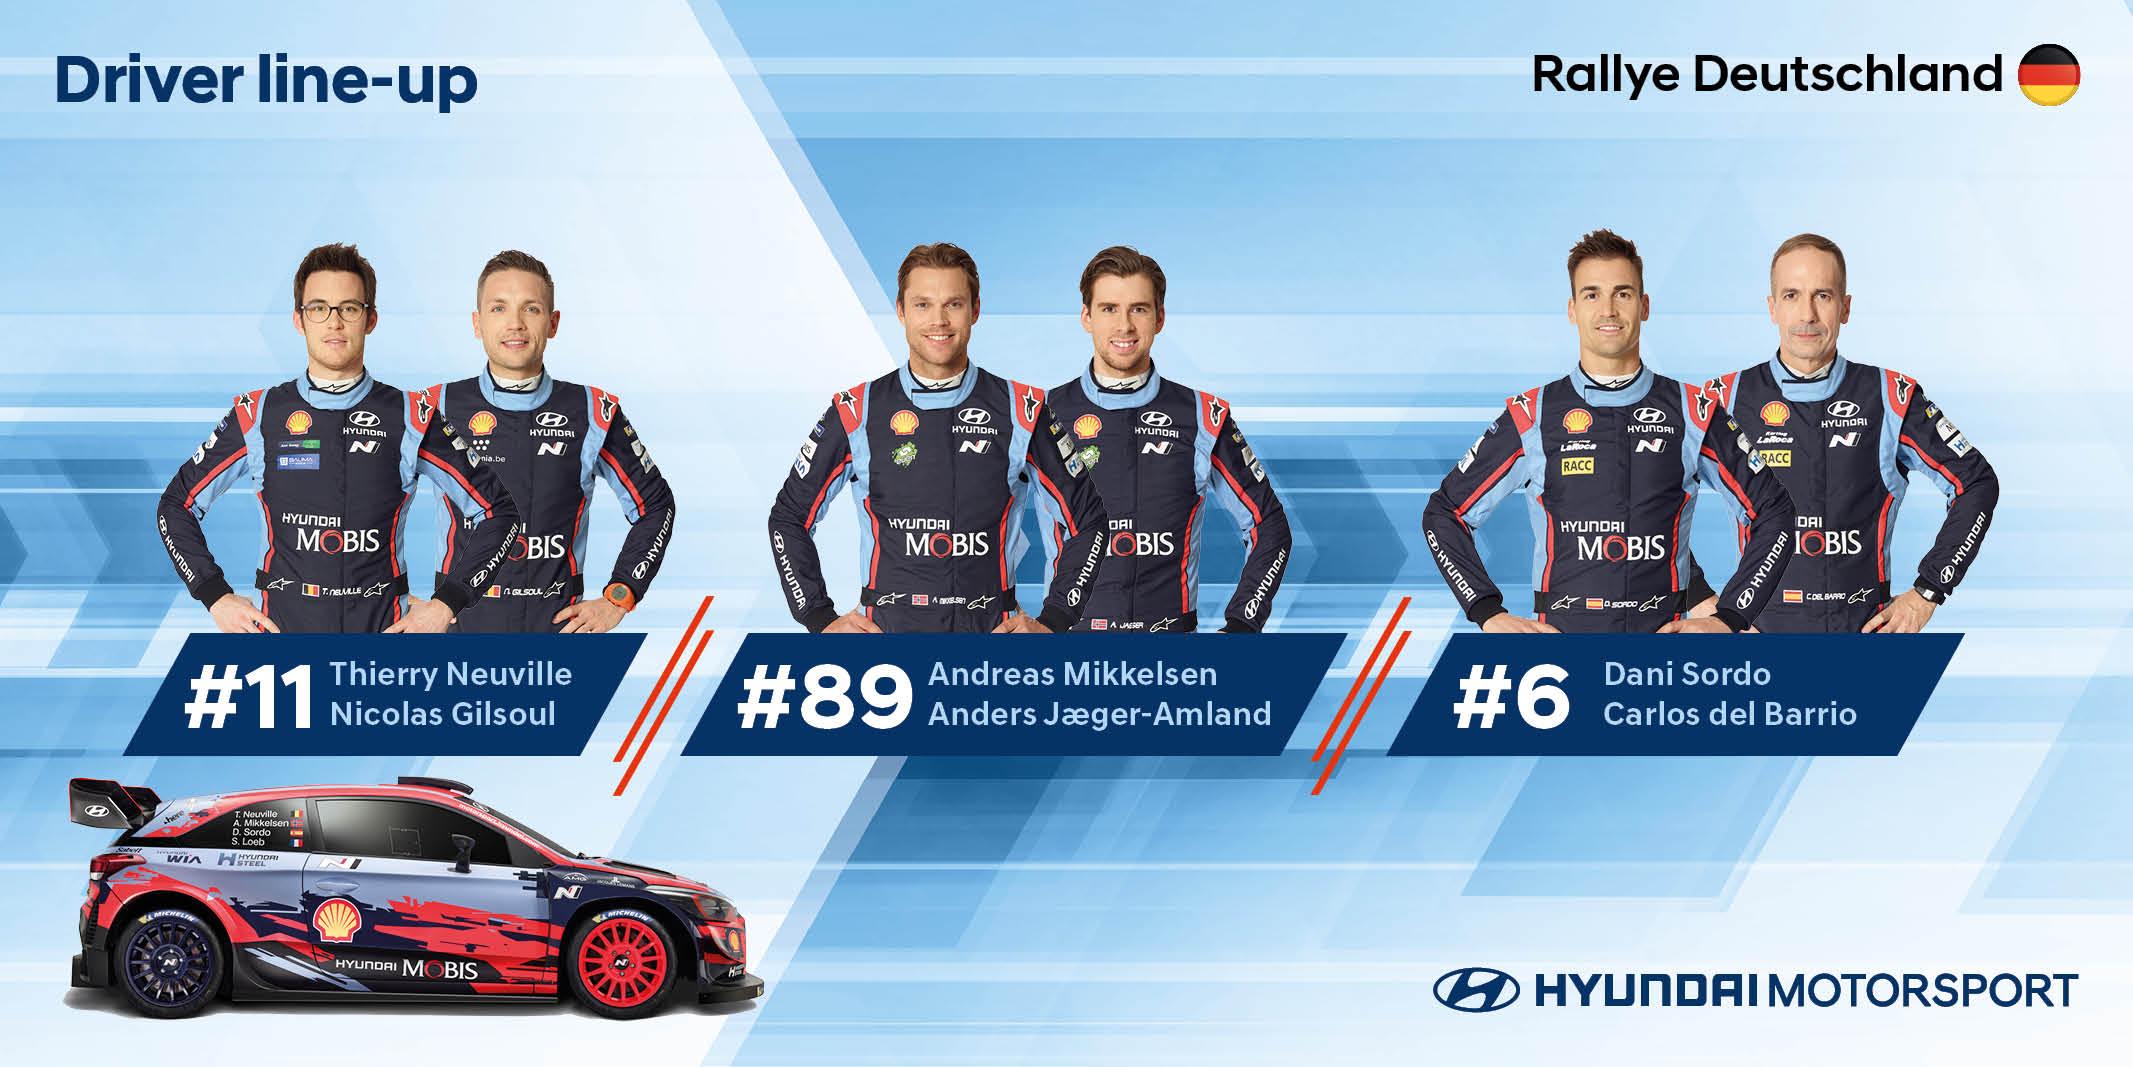 World Rally Championship: Temporada 2019 - Página 35 EBRL5tZXUAEhMY1?format=jpg&name=4096x4096